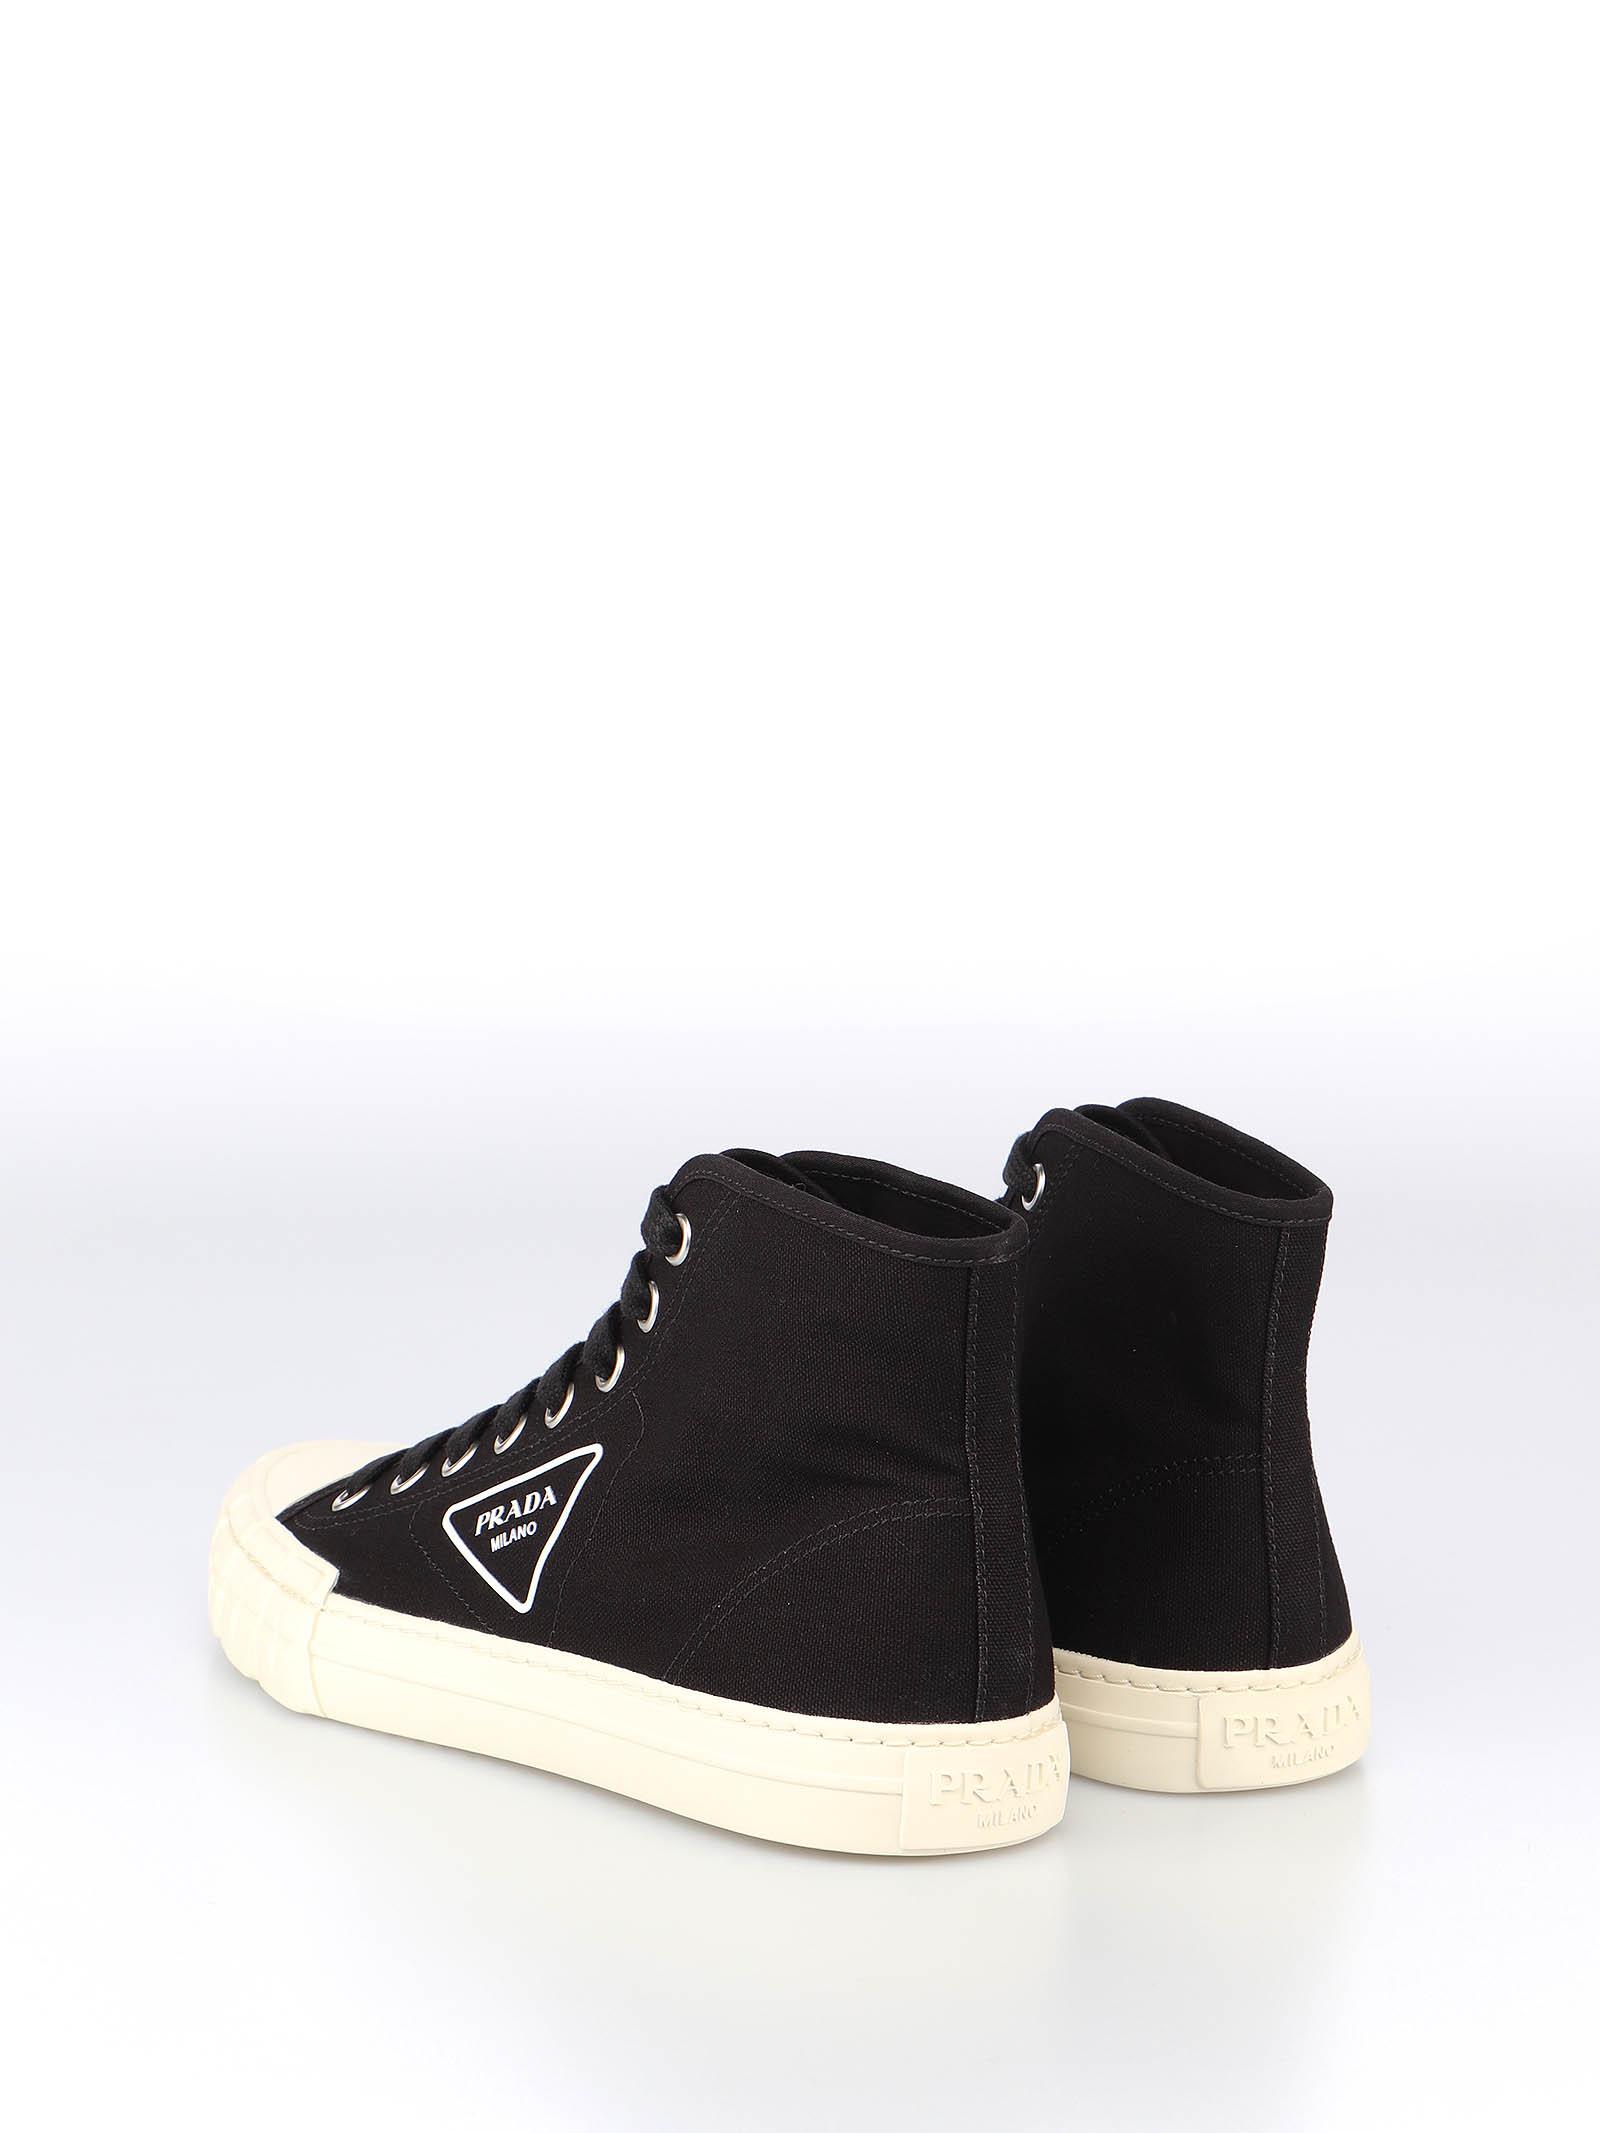 Picture of Prada | Wheel Vulcanizzato Tech Fabric High-Top Sneaker